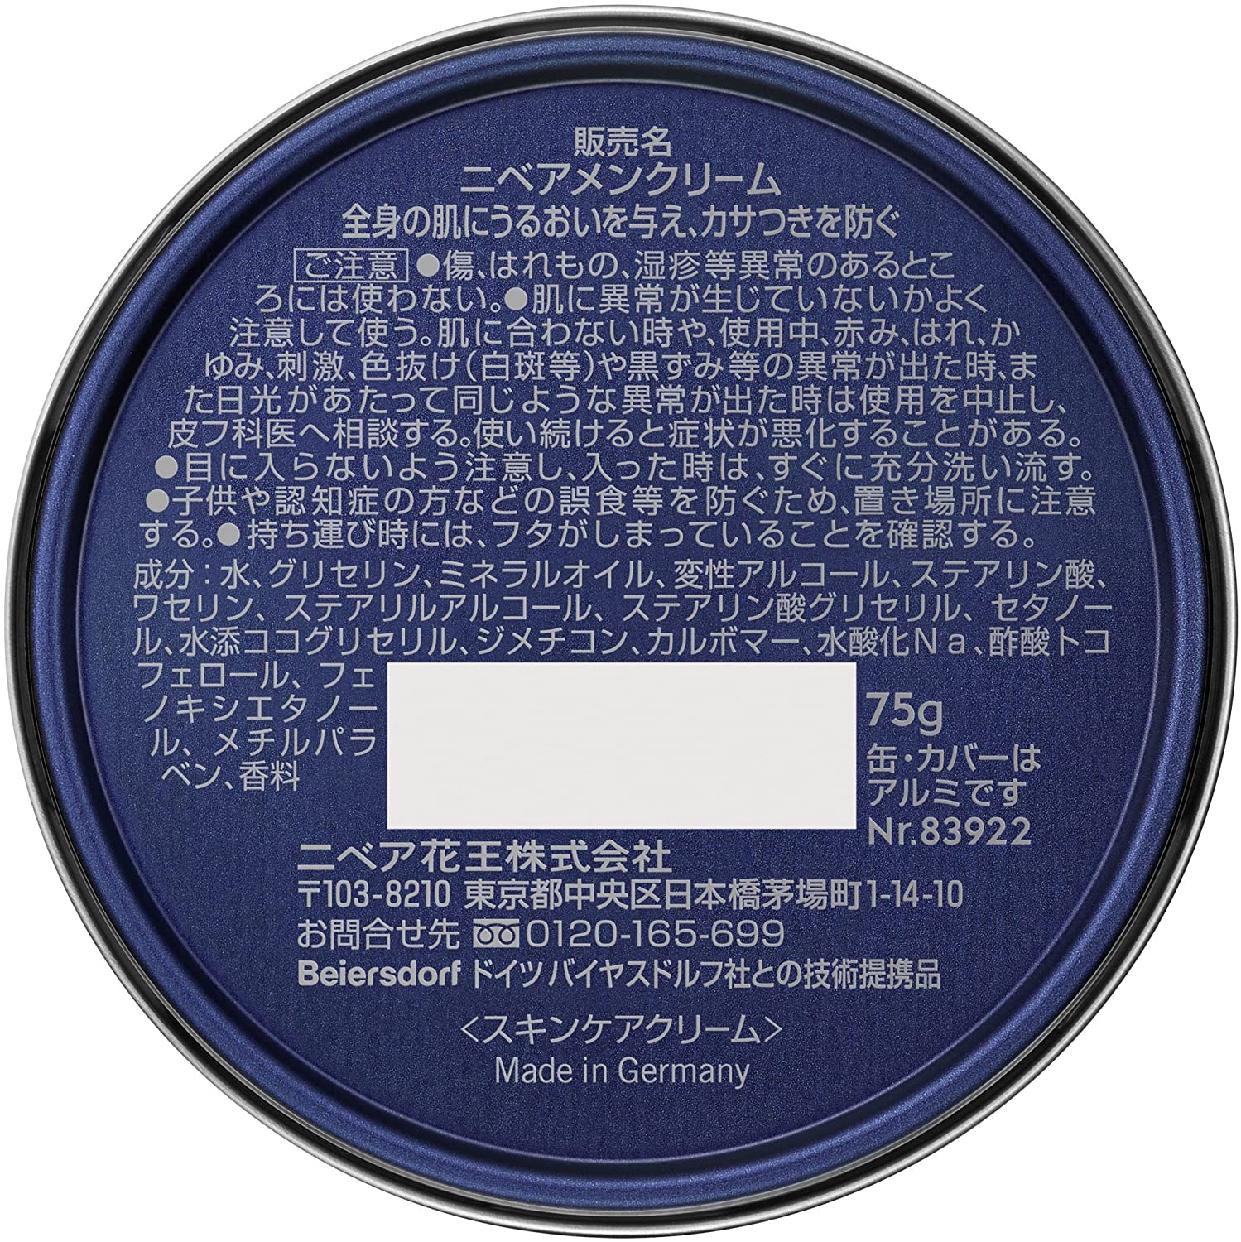 NIVEA MEN(ニベアメン)クリームの商品画像2